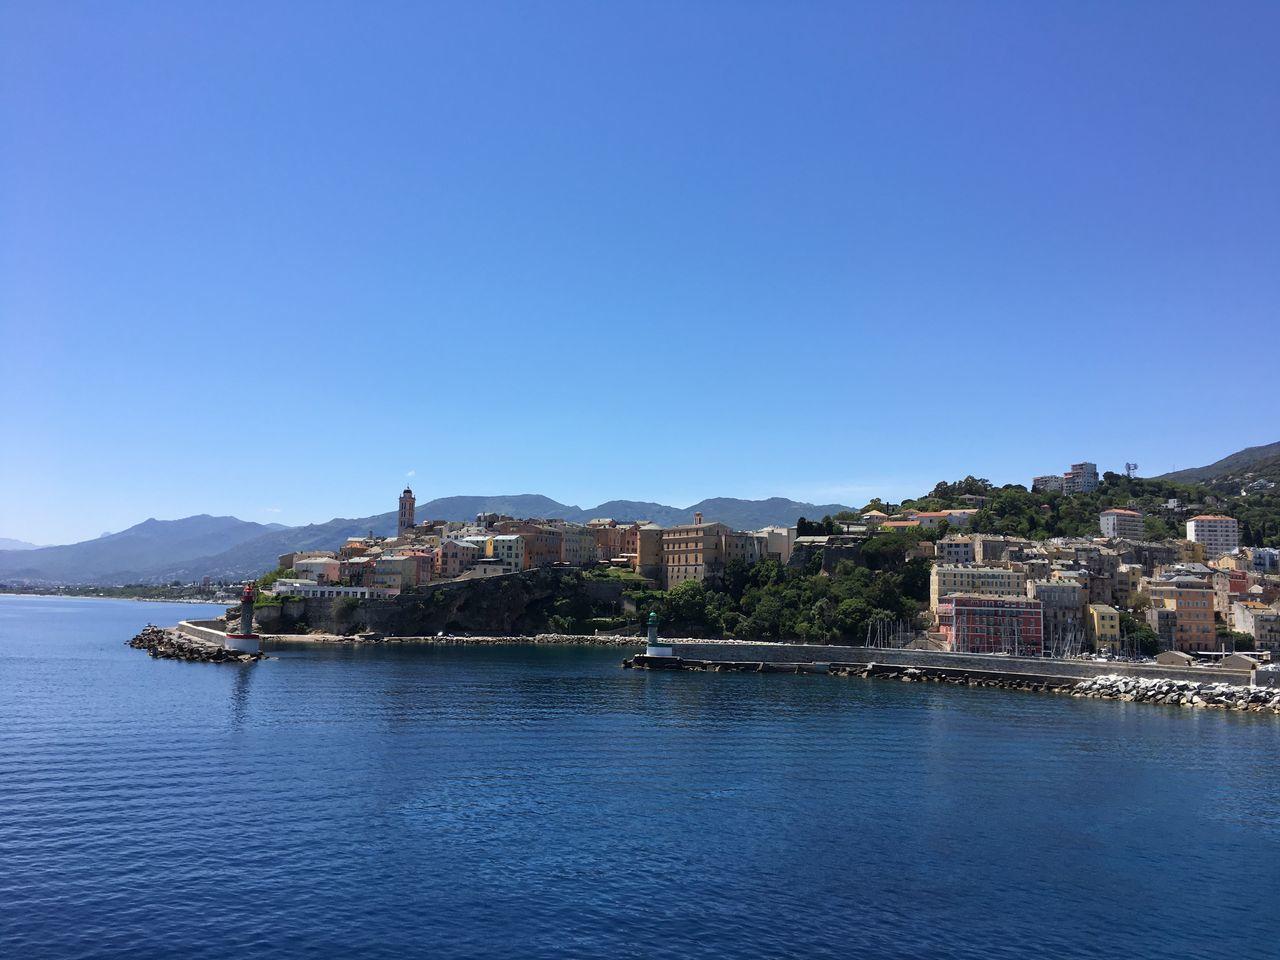 Bastia Citadelle Vieux Port Mer Corse